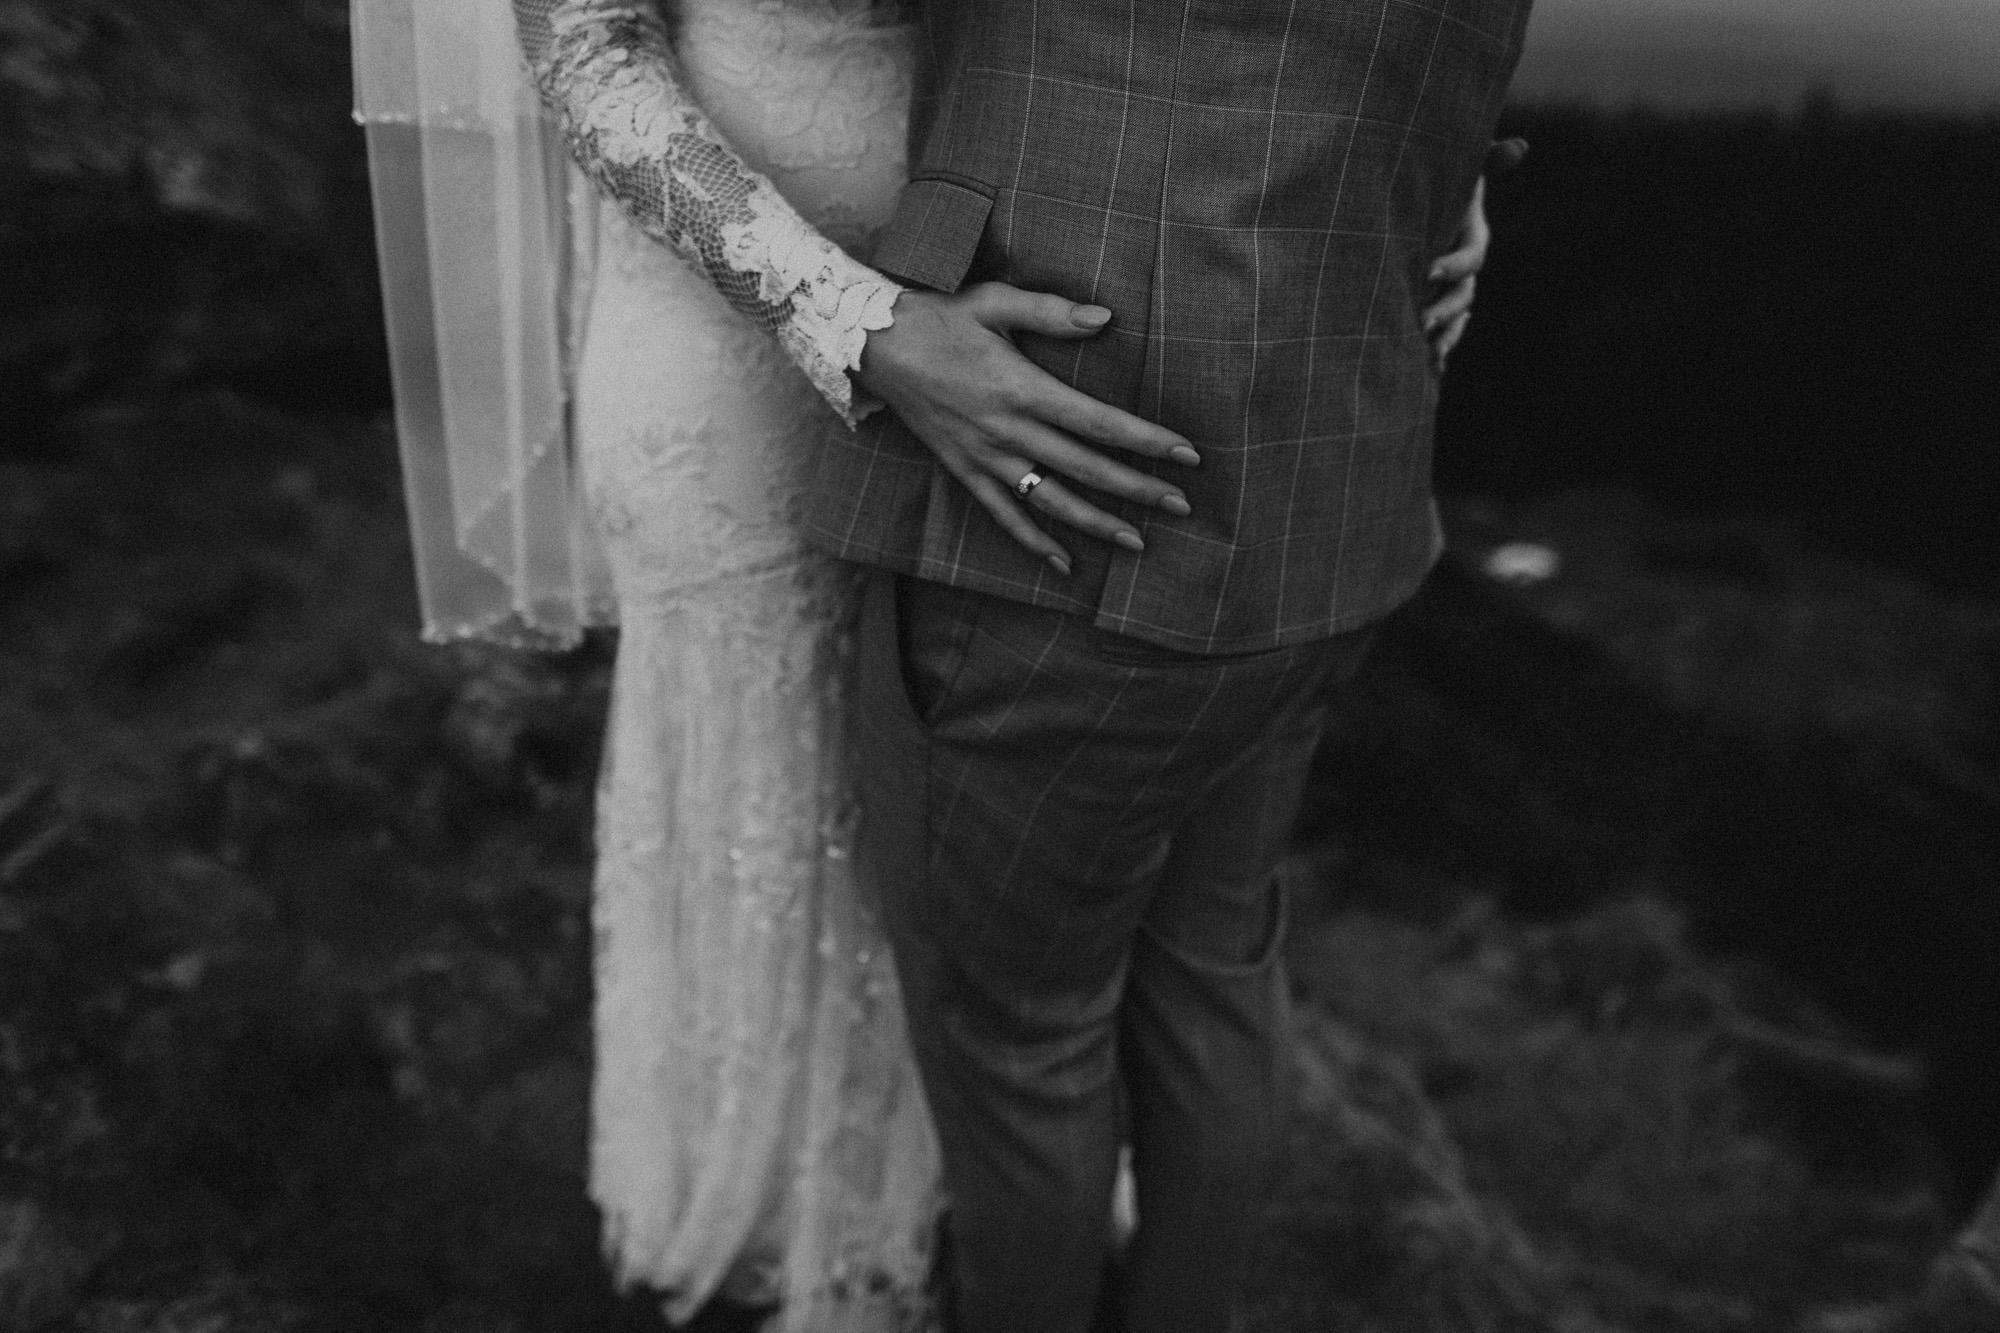 DanielaMarquardtPhotography_Hochzeitsfotograf_Düsseldorf_Köln_Mallorca_Bayern_Austria_Harz_LinaundMaik_Afterwedding-Shooting_Weddingphotographer_Ibiza_Tuskany_Italien_Toskana44